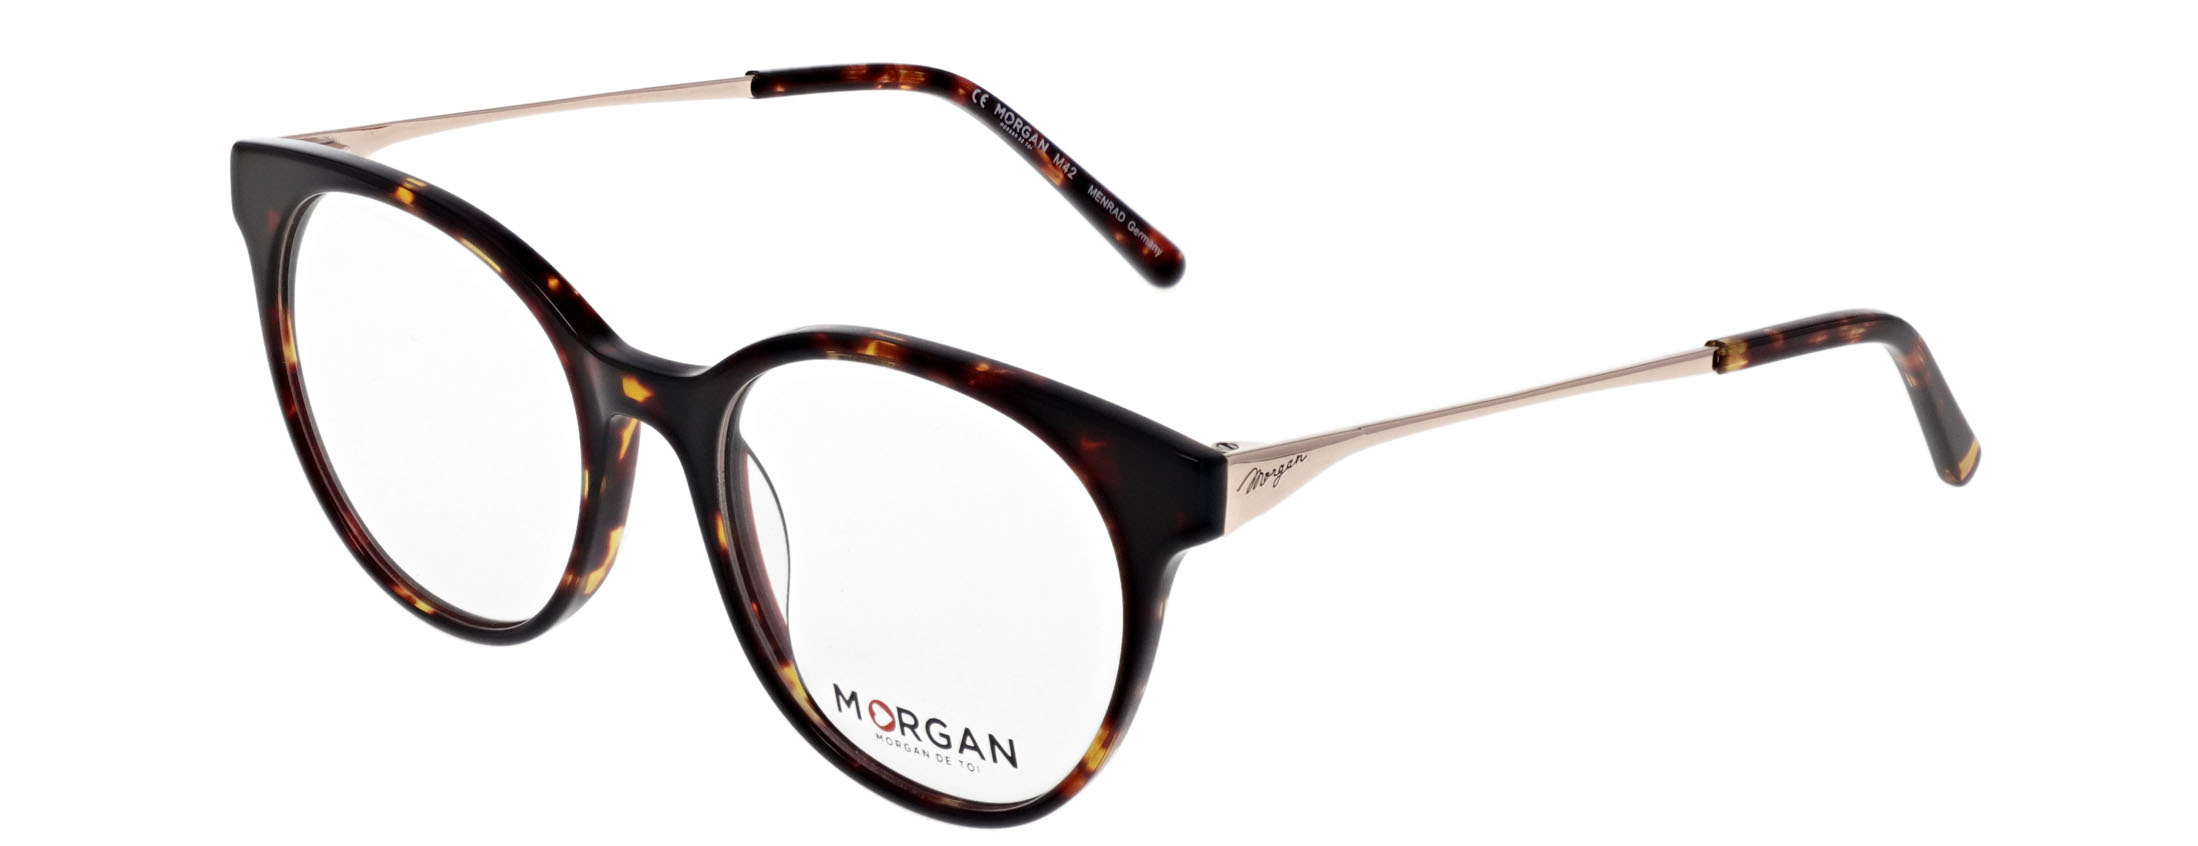 Morgan 202026 5100